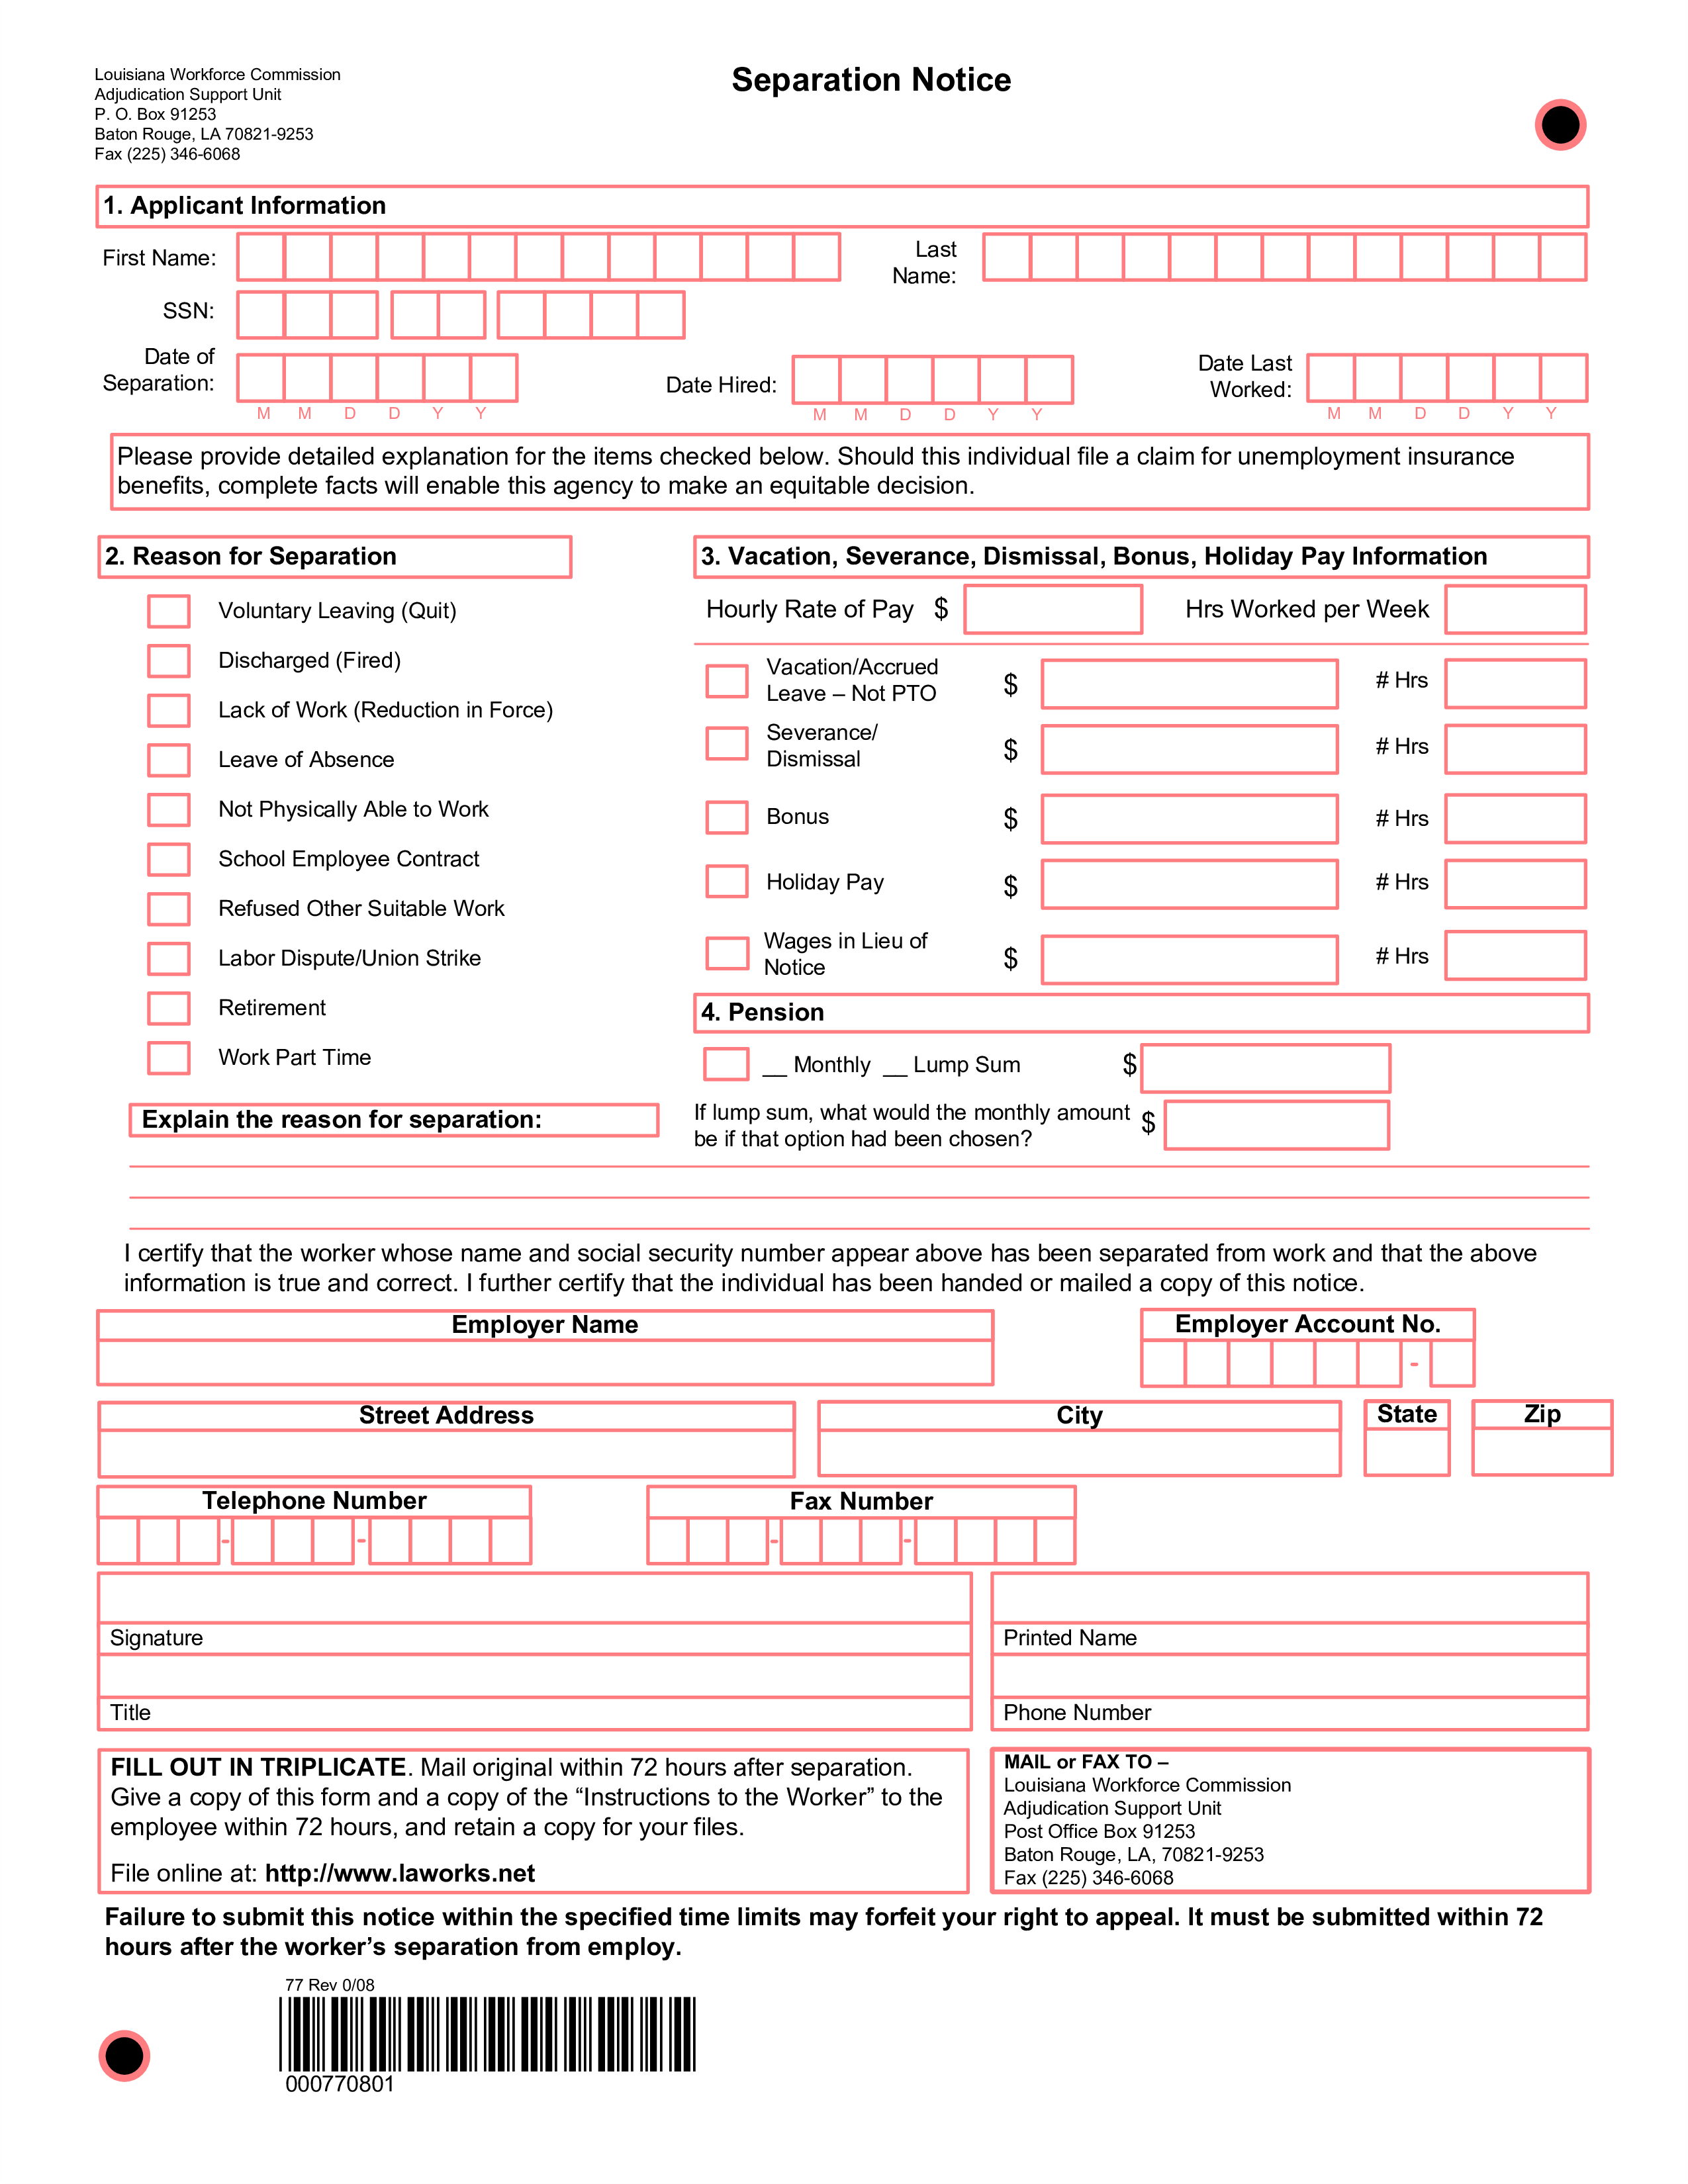 Free Job Separation Notice | Templates at allbusinesstemplates.com